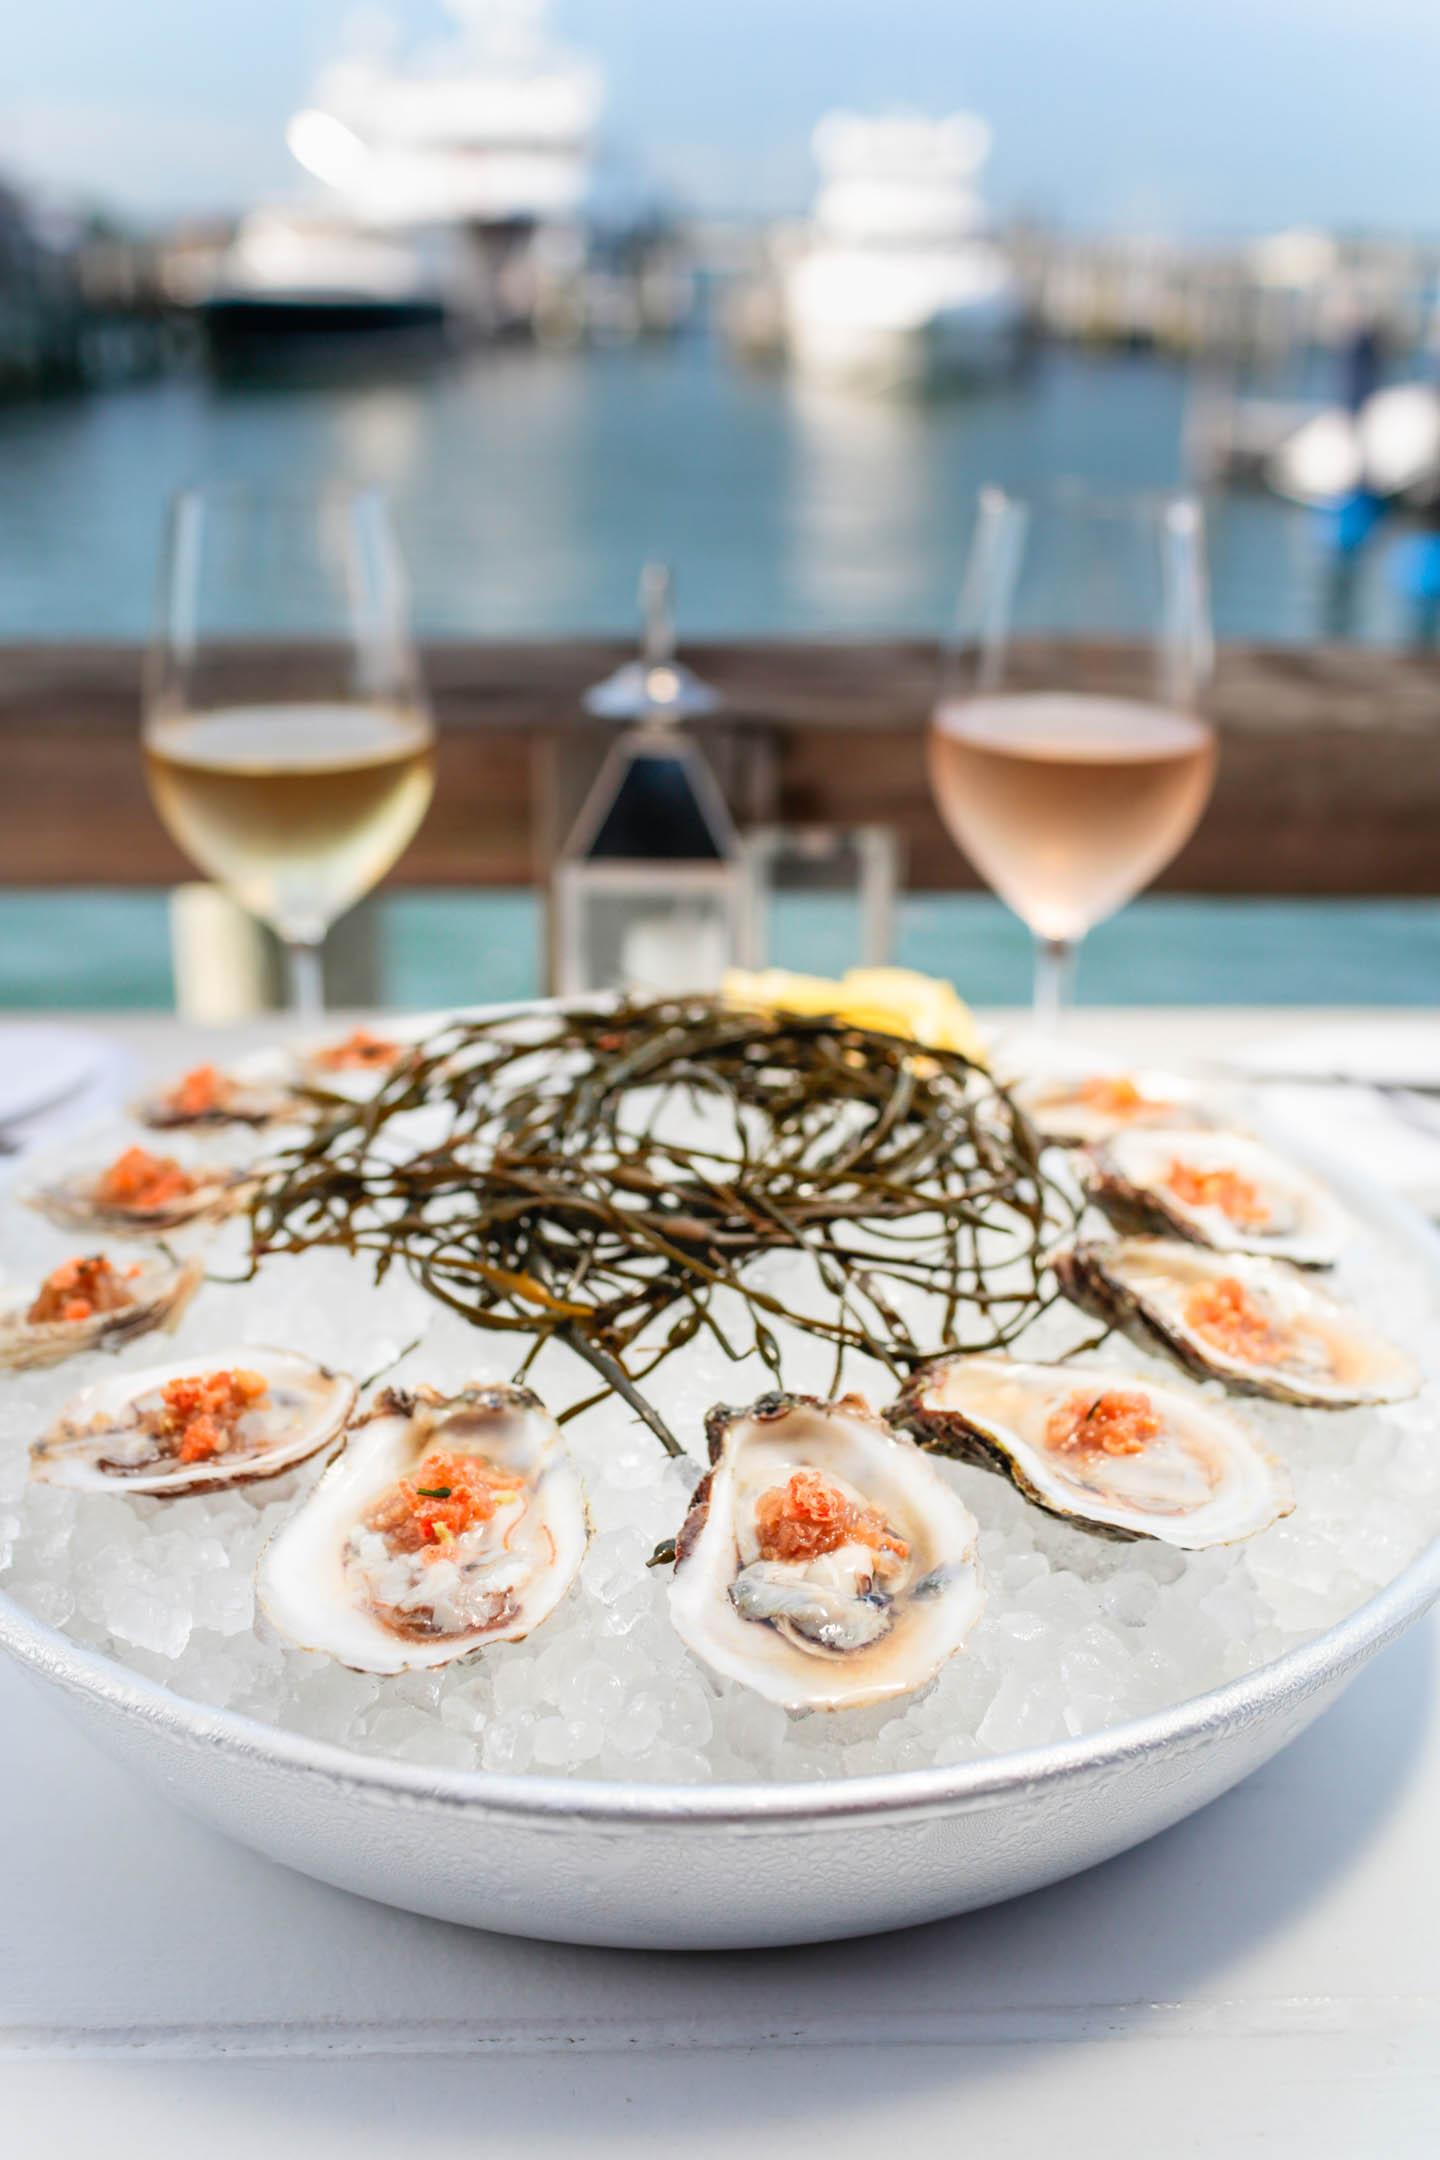 striffler-photography-lifestyle-food-Hamptons-33.jpg